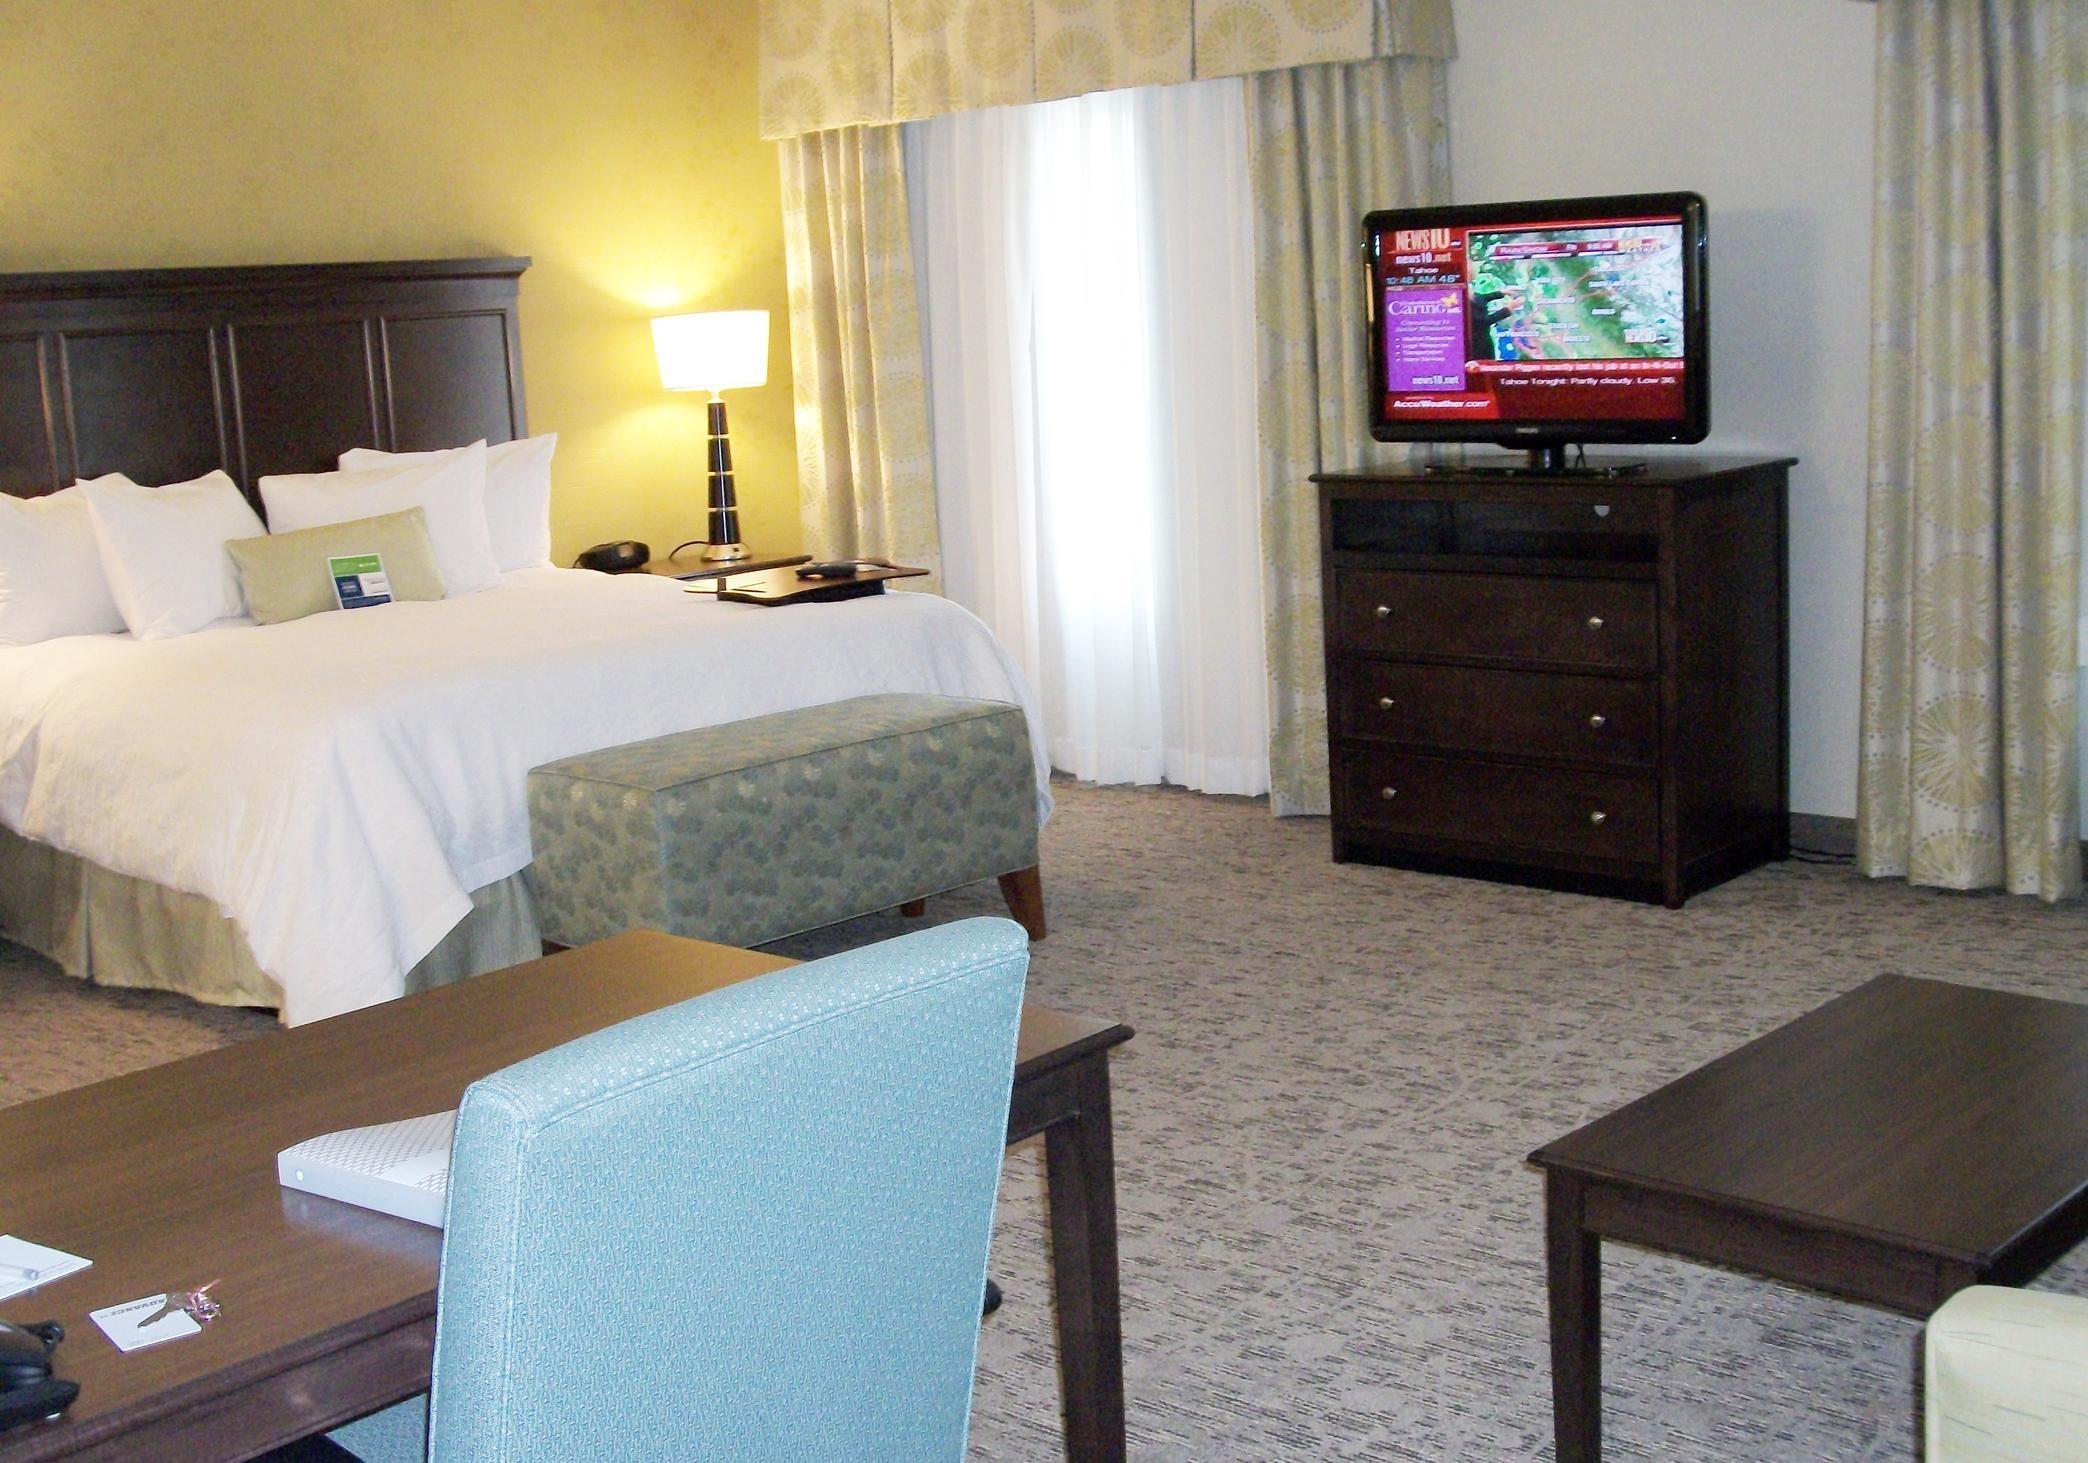 Hampton Inn & Suites Manteca image 24